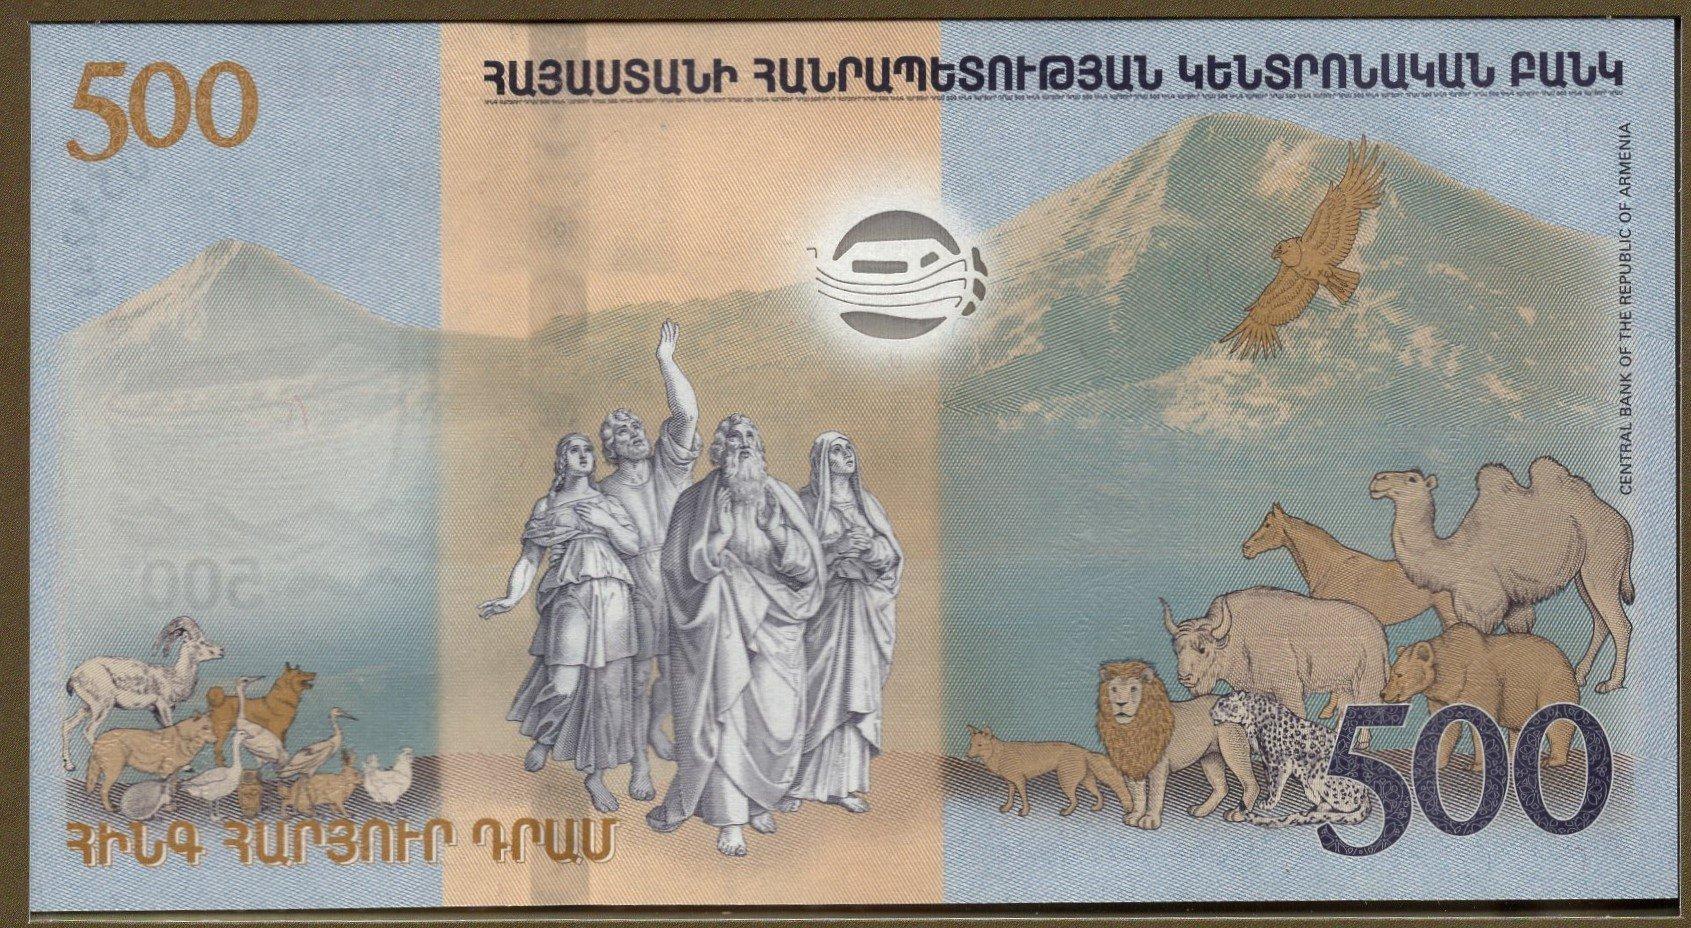 Armenia 500 dram 2017 banknote for sale